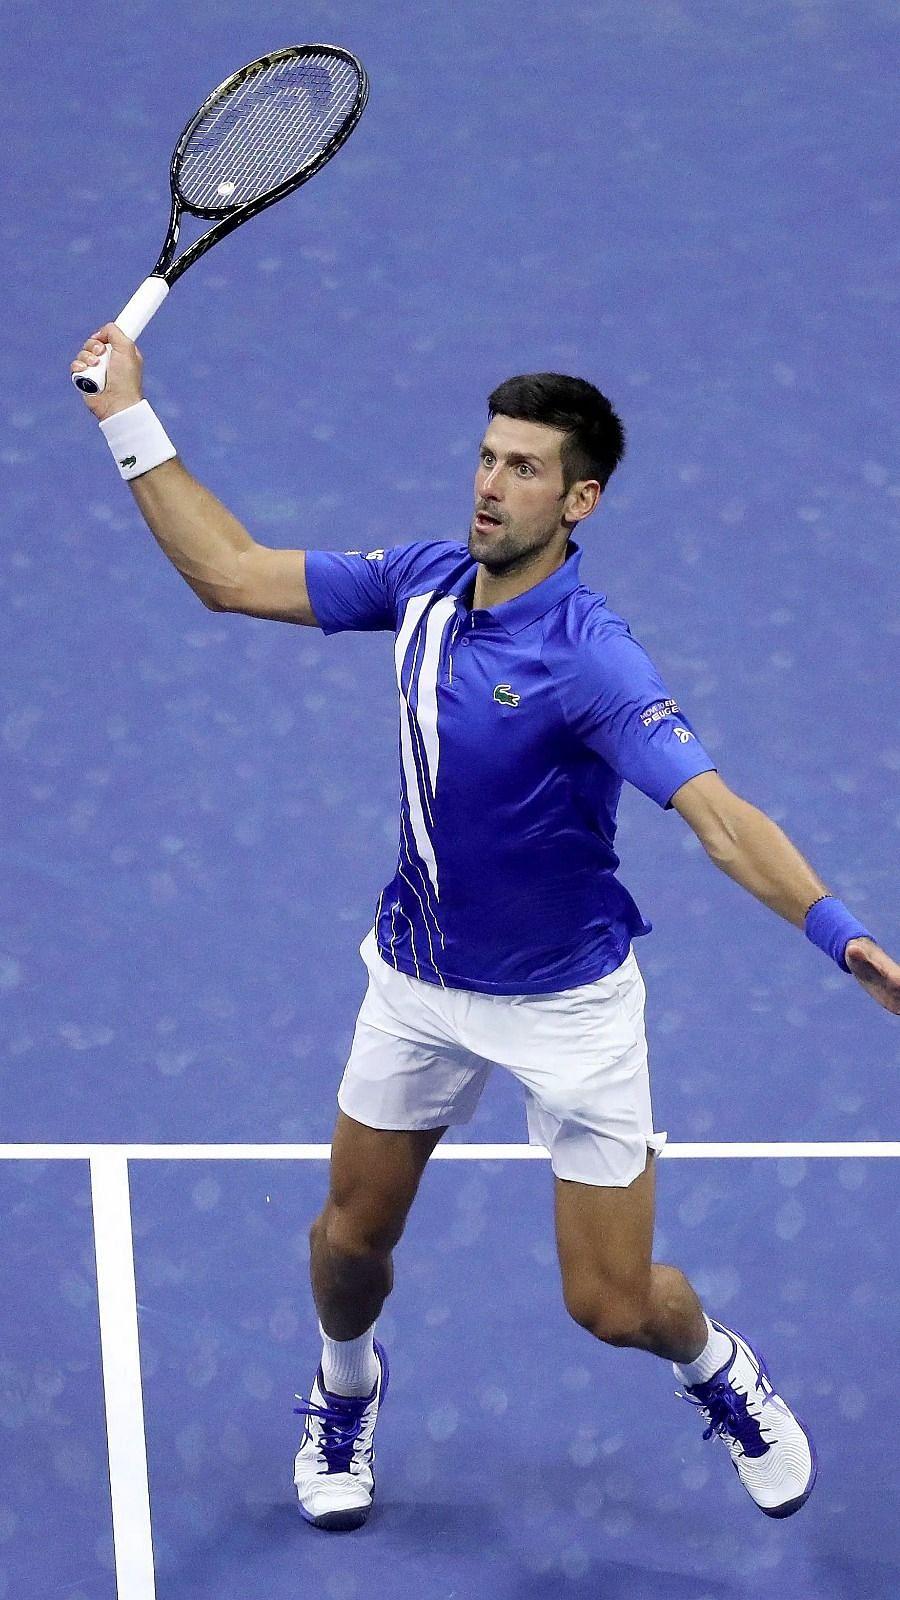 It Was Like When You Break Up With A Girl Via Email Navratilova Slams Novak Djokovic For Skipping Press Conference